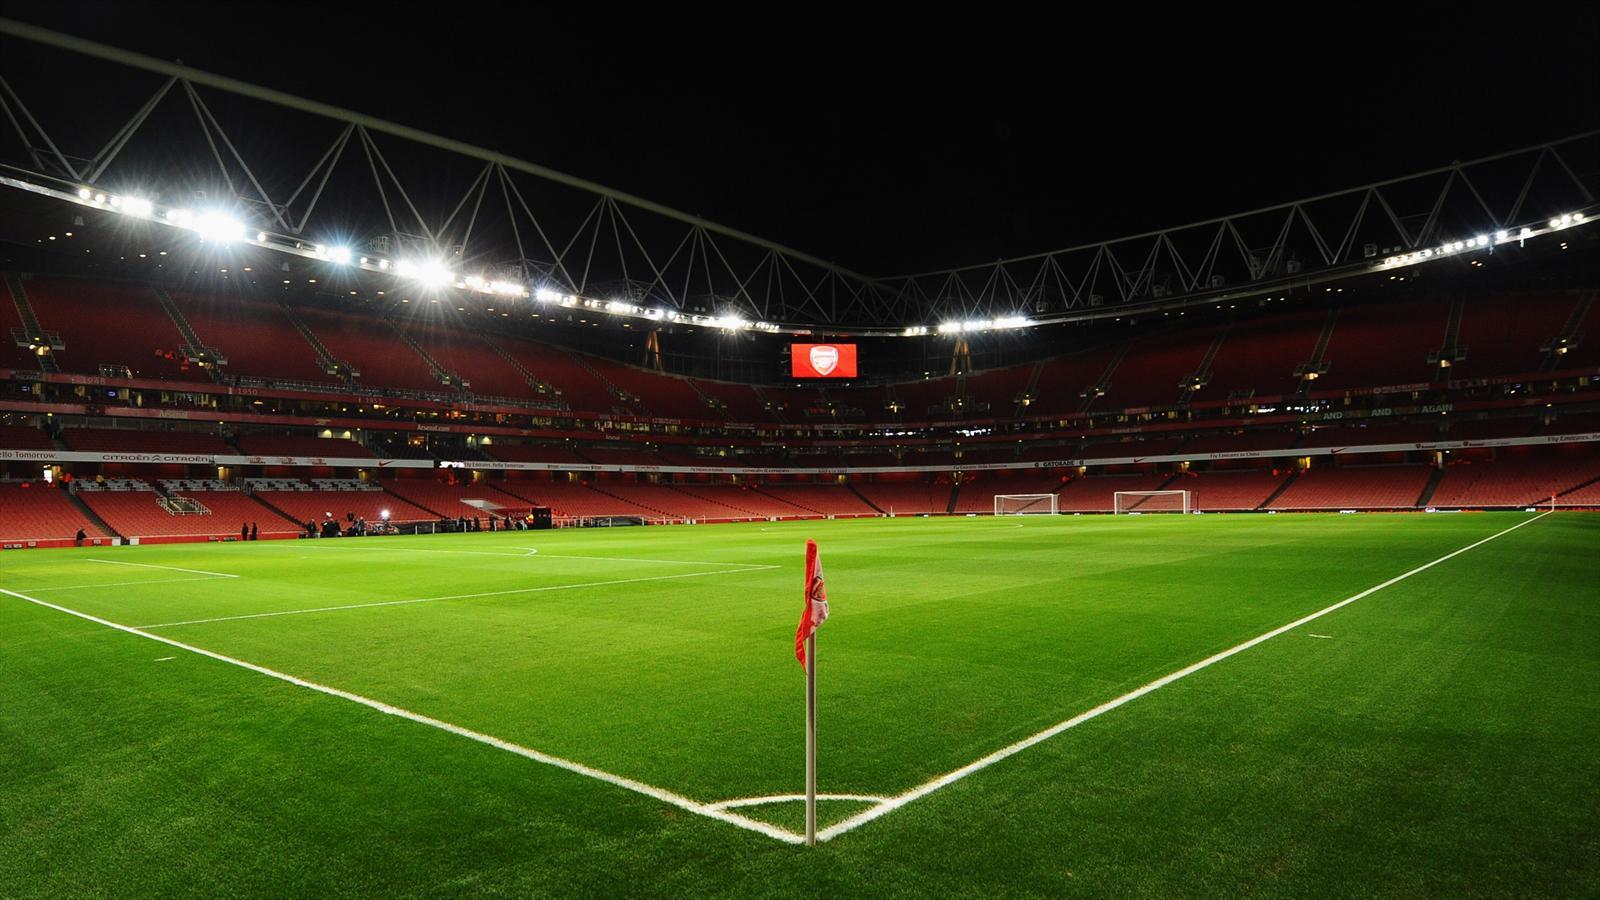 Arsenal, ton stade se meurt - Premier League 2017-2018 ...